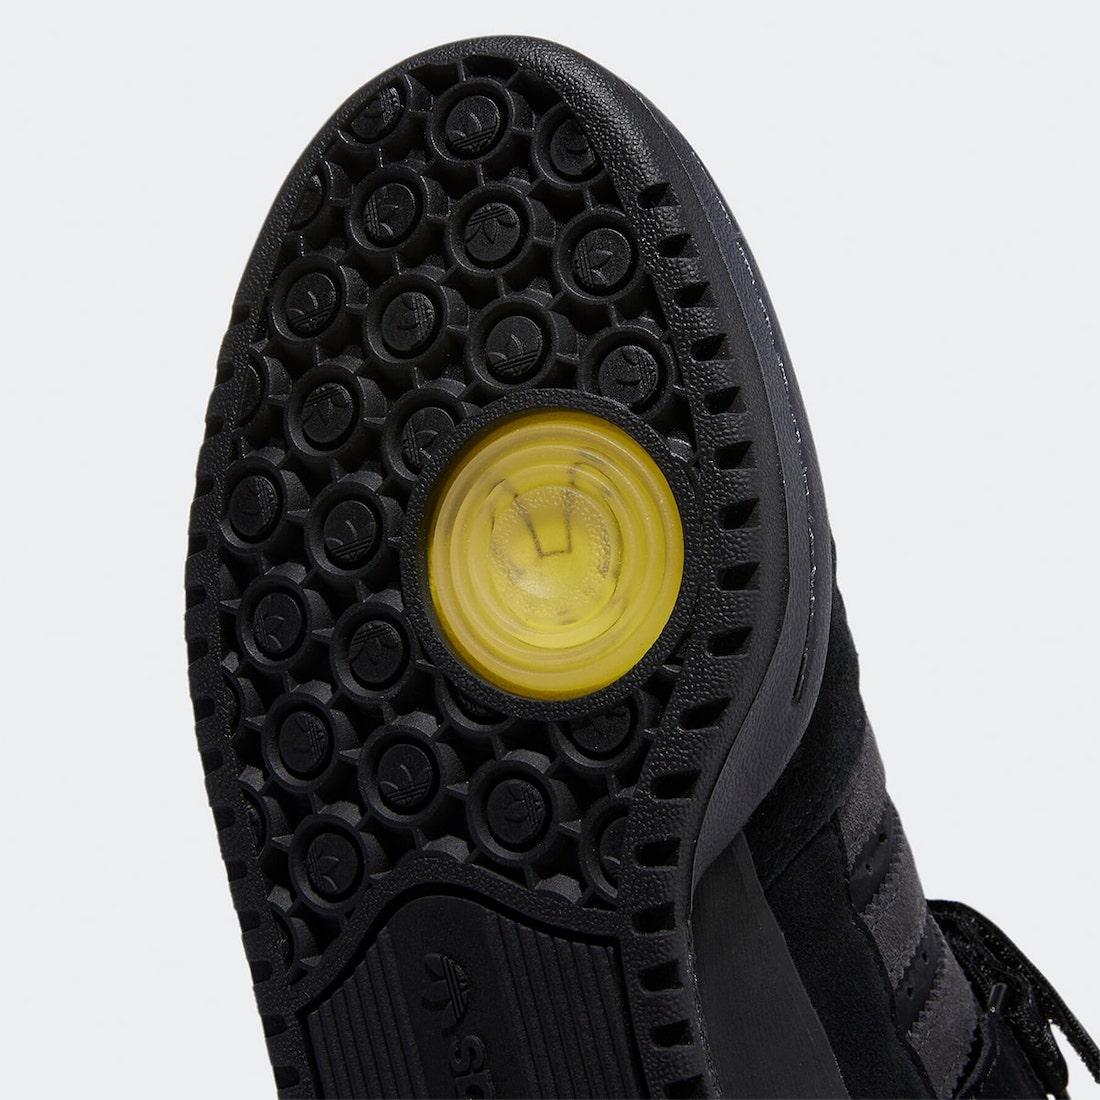 Bad-Bunny-adidas-Forum-Buckle-Low-Black-GW5021-Release-Date-6